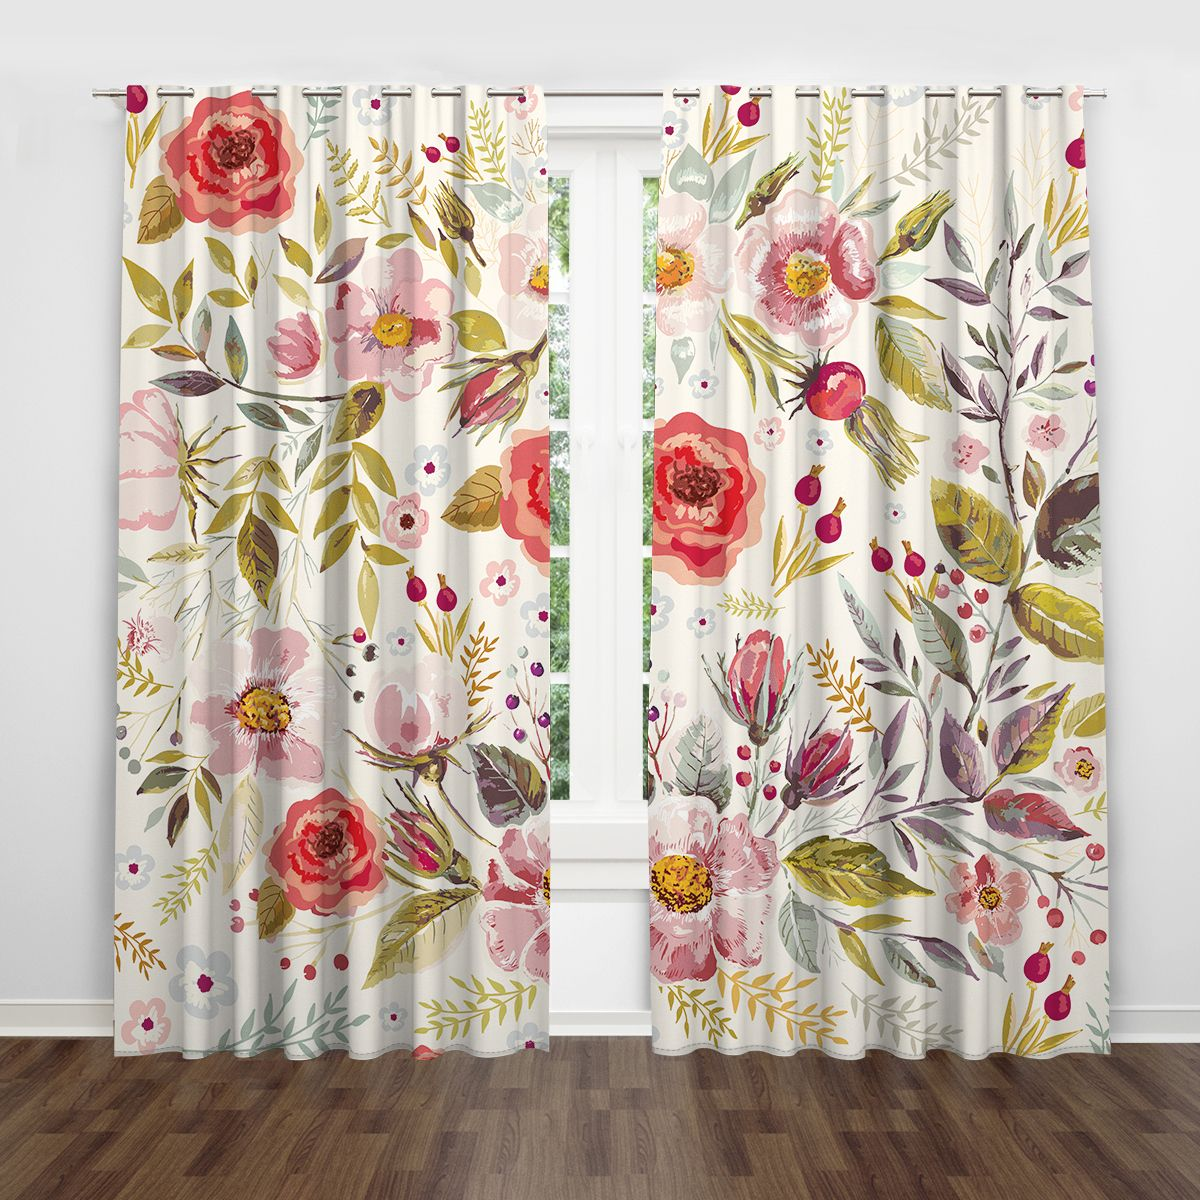 Red Flowers Country Sheer Curtain Sheer Sheercurtain Custommade